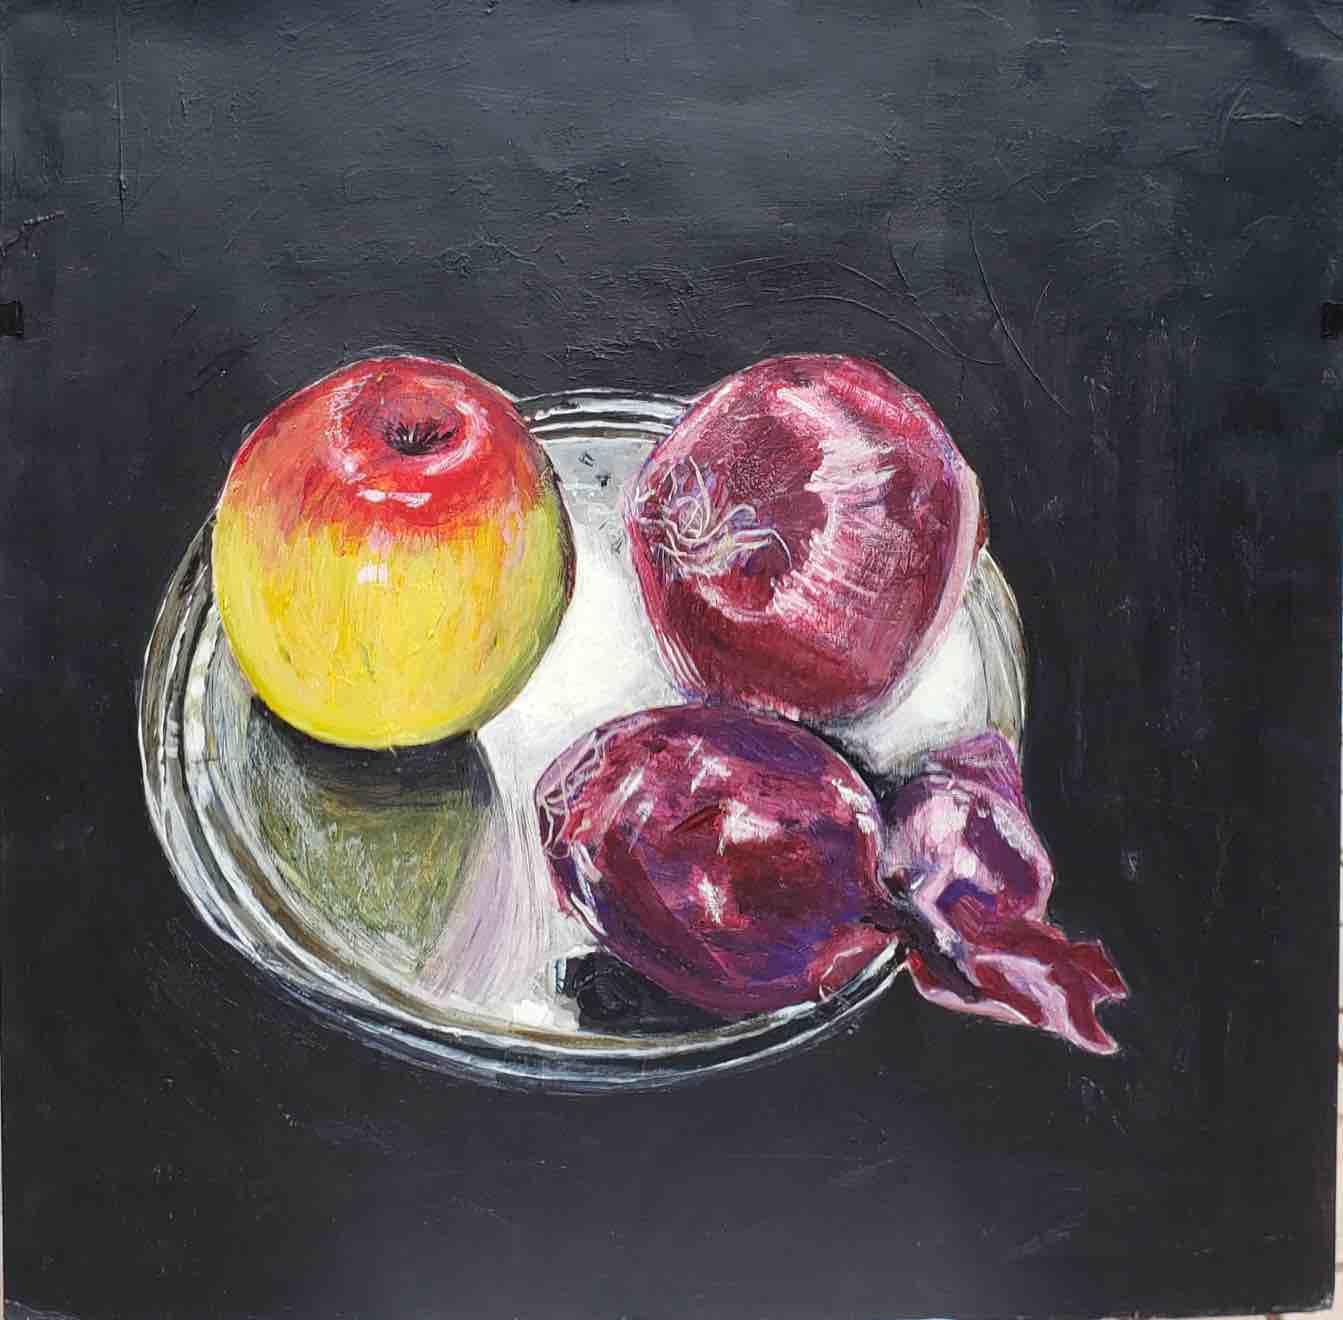 pomme-petits-oignons-2